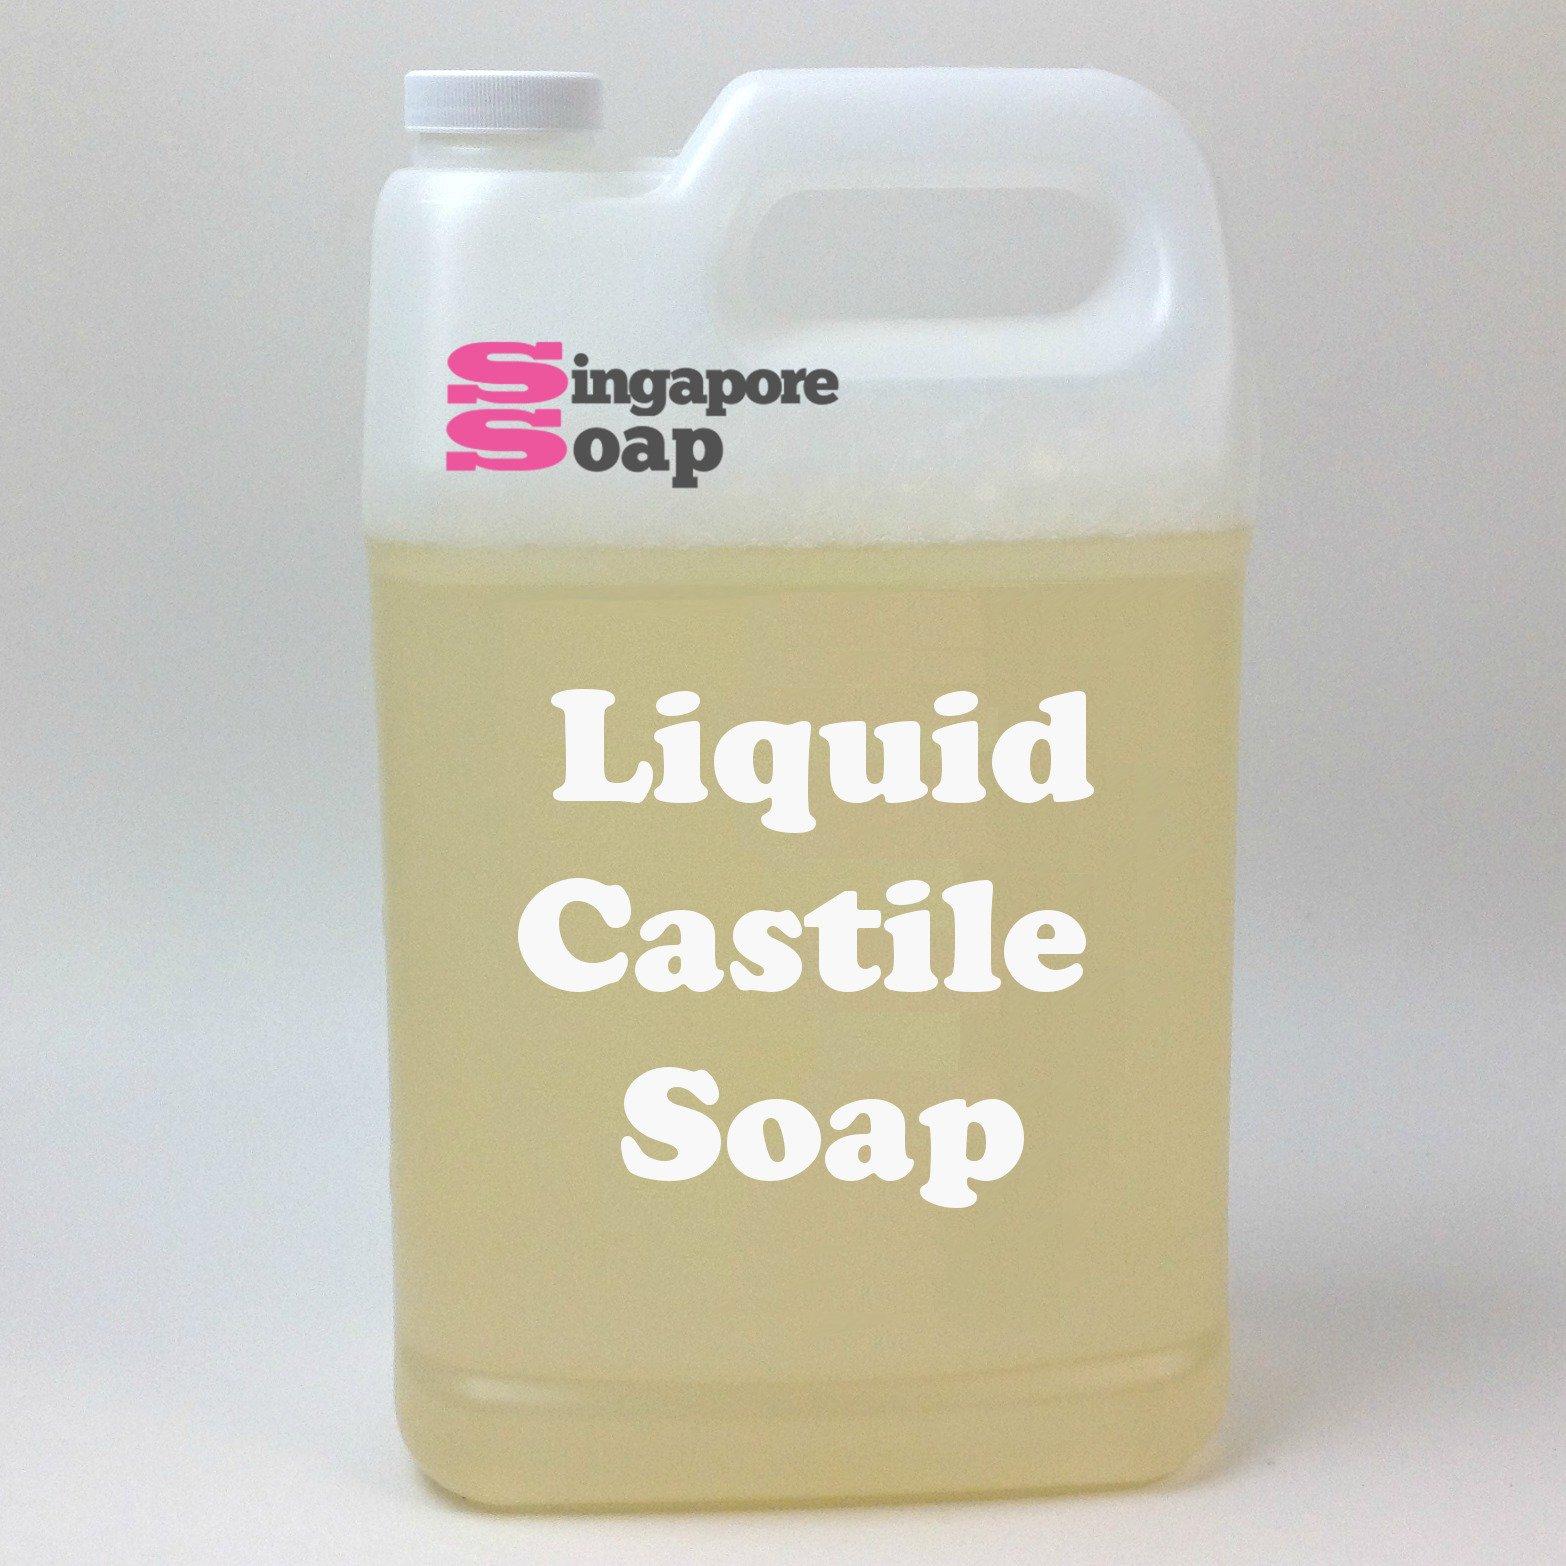 where to buy liquid castile soap in singapore singapore soap supplies. Black Bedroom Furniture Sets. Home Design Ideas